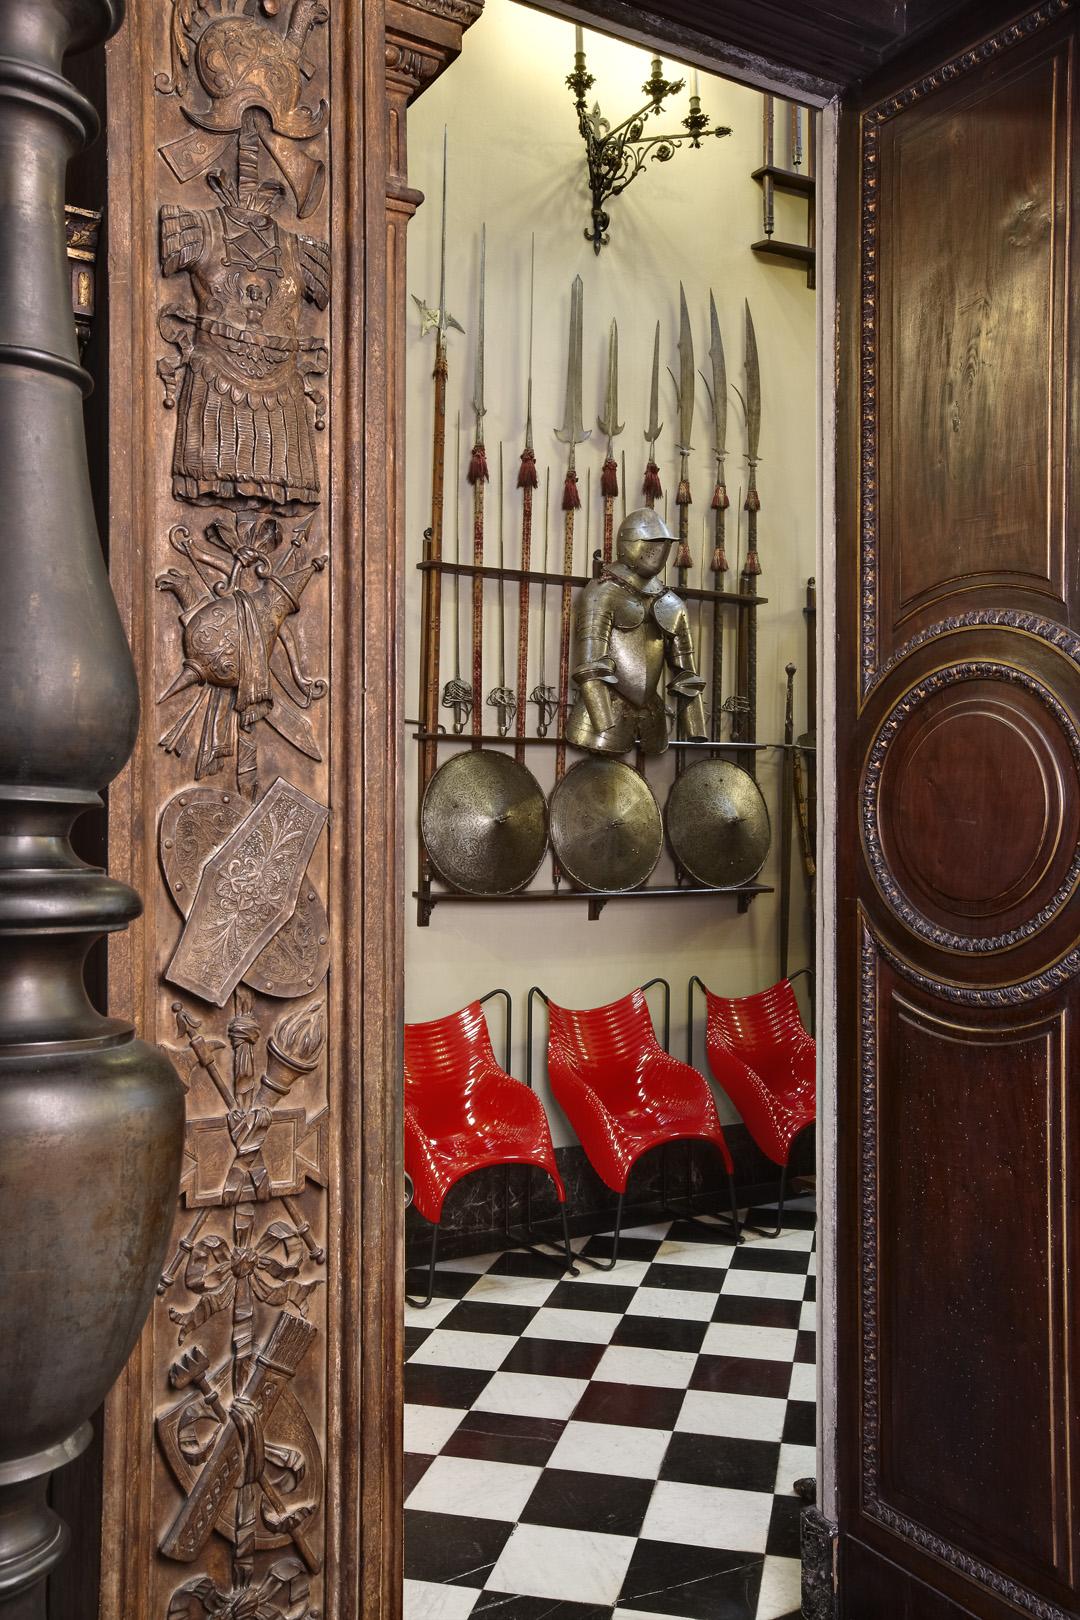 https://www.pasqualeformisano.com/wp-content/uploads/2016/11/Museo_Bagatti_Valsecchi_01.jpg